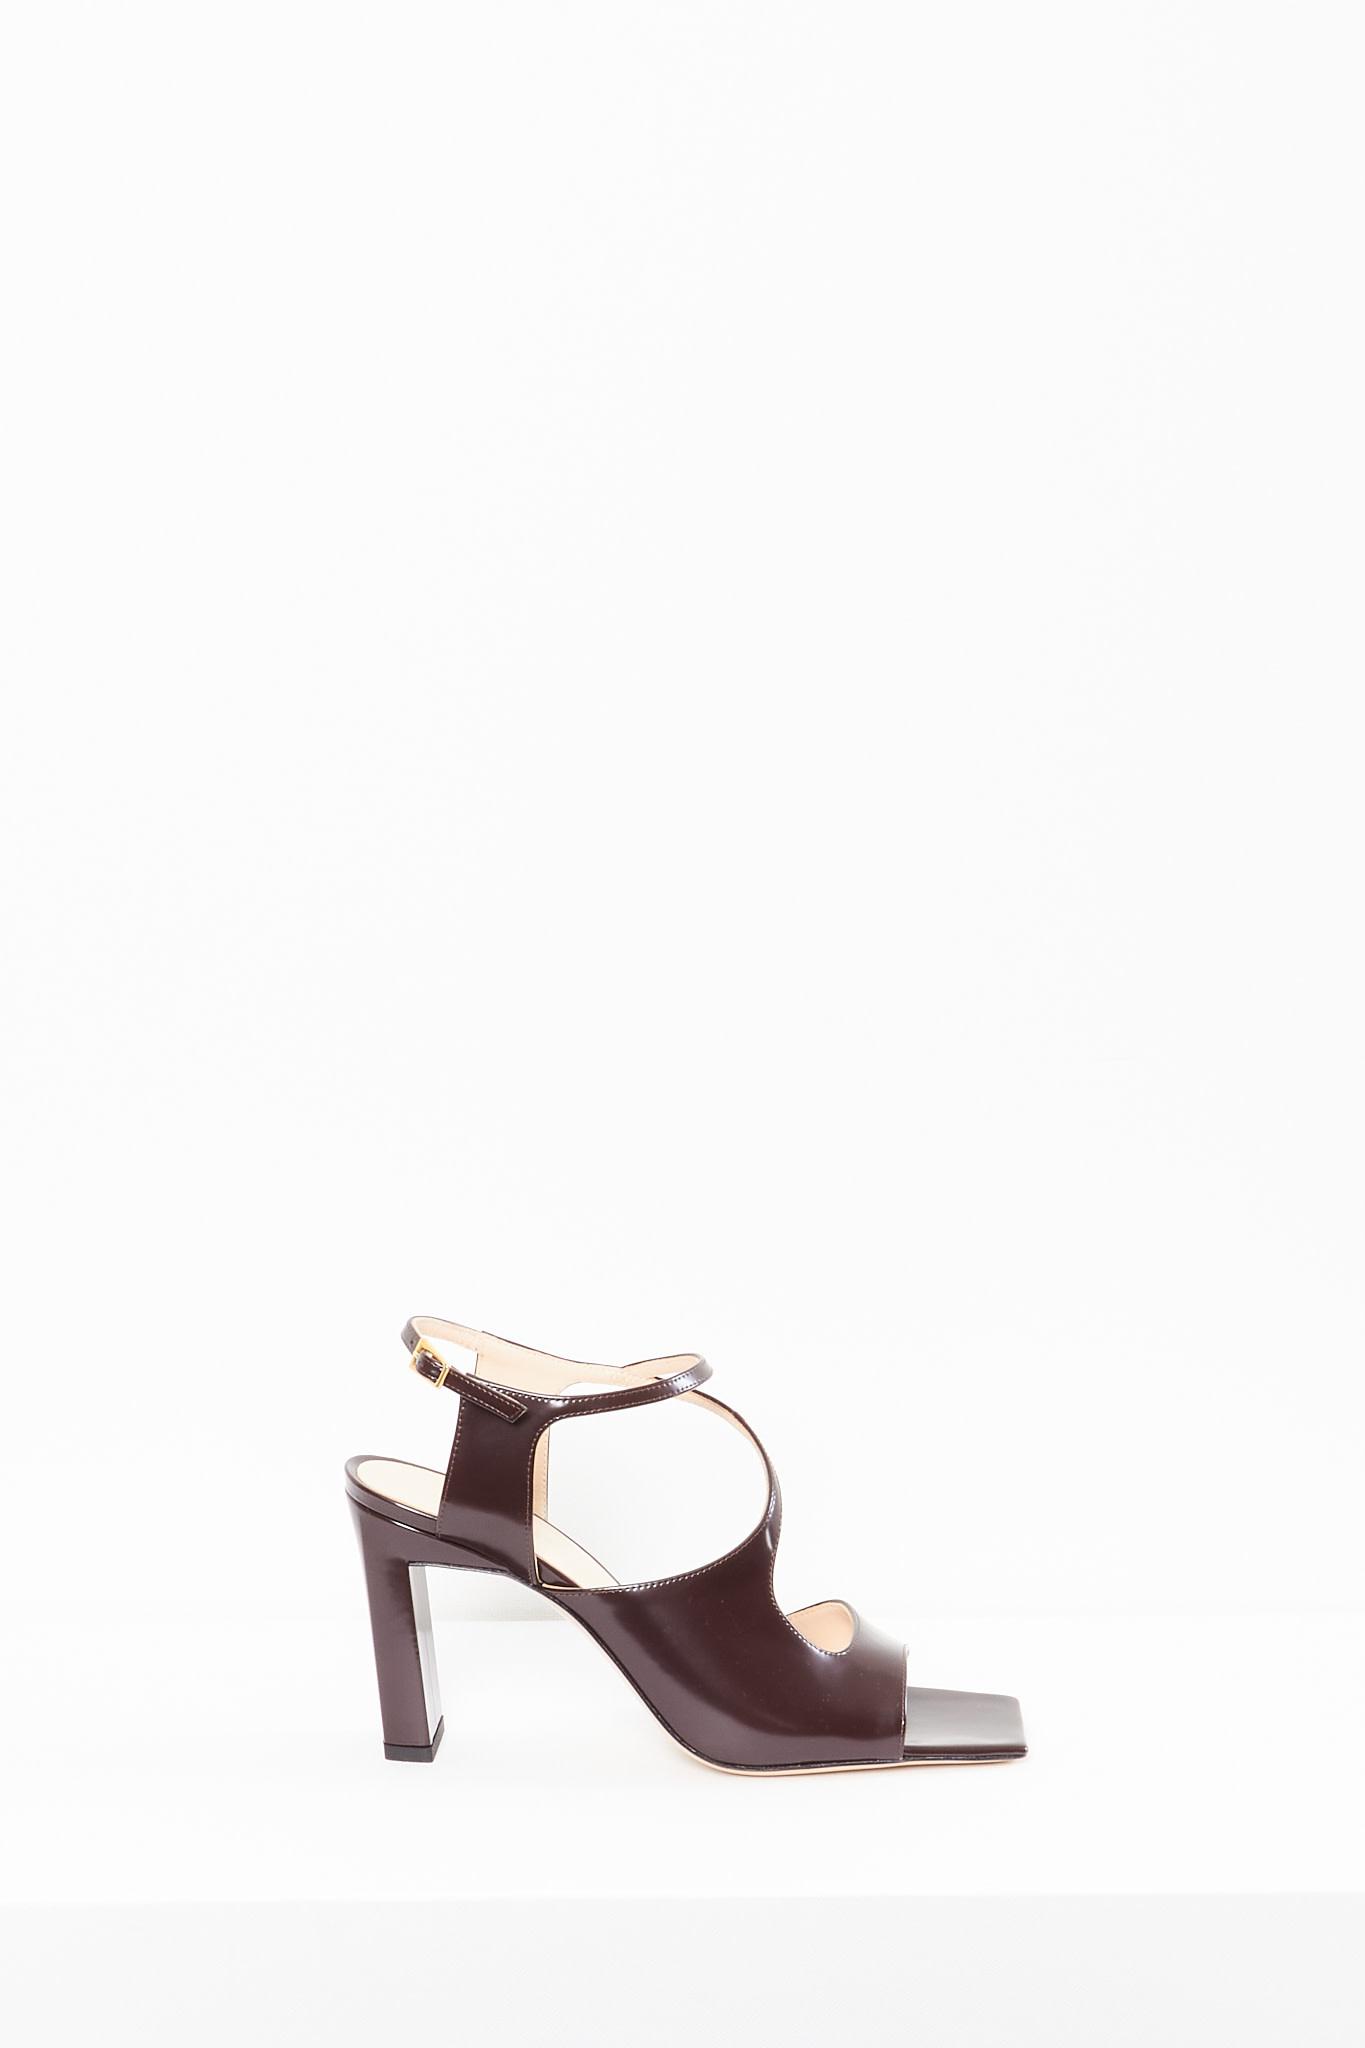 Wandler - Blair sandal